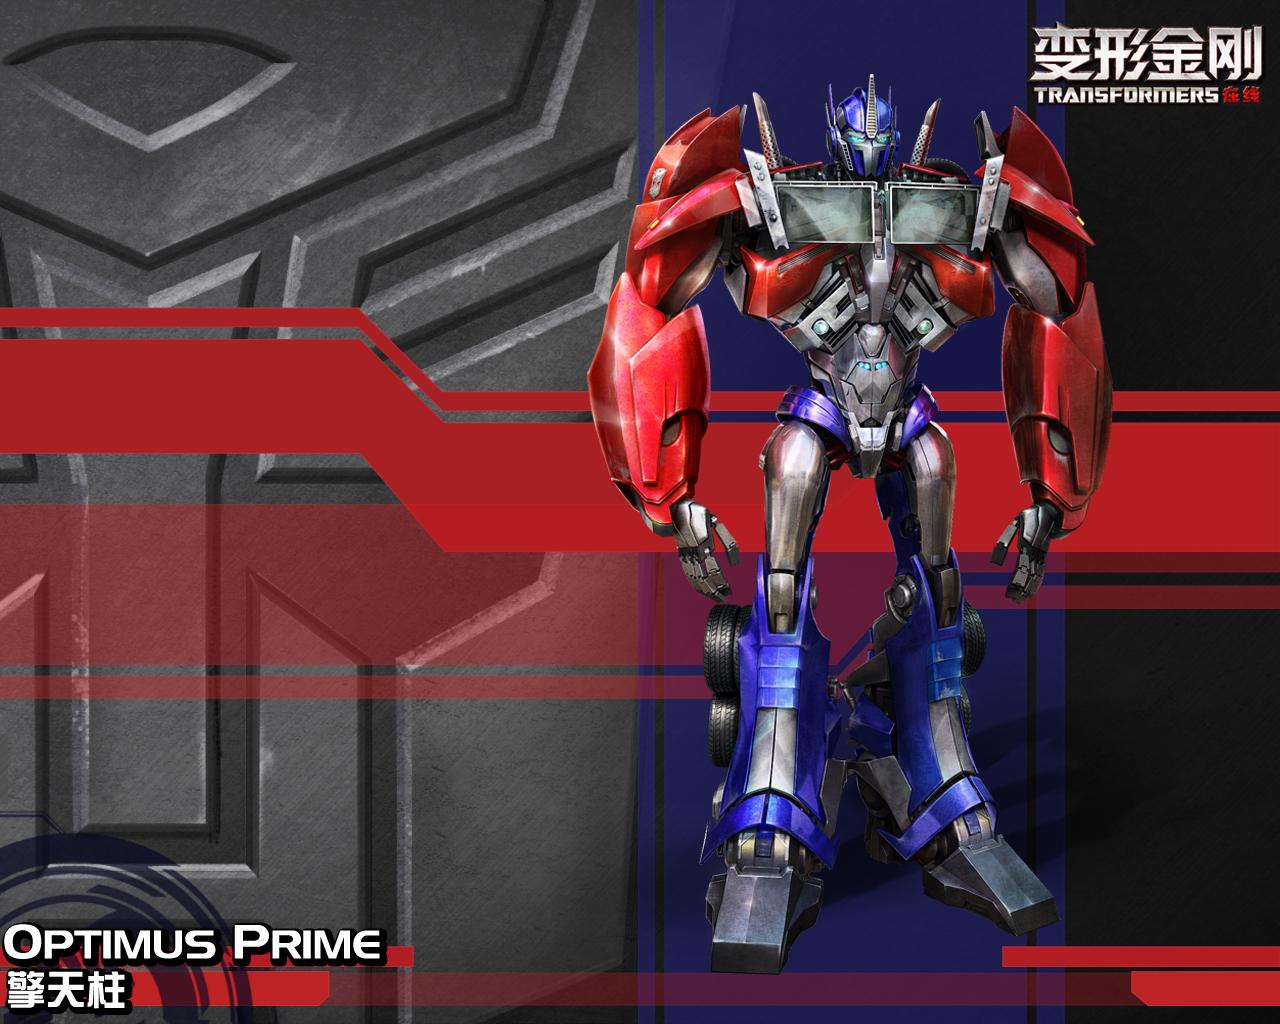 Transformers prime transformers prime wallpaper - Transformers prime wallpaper ...